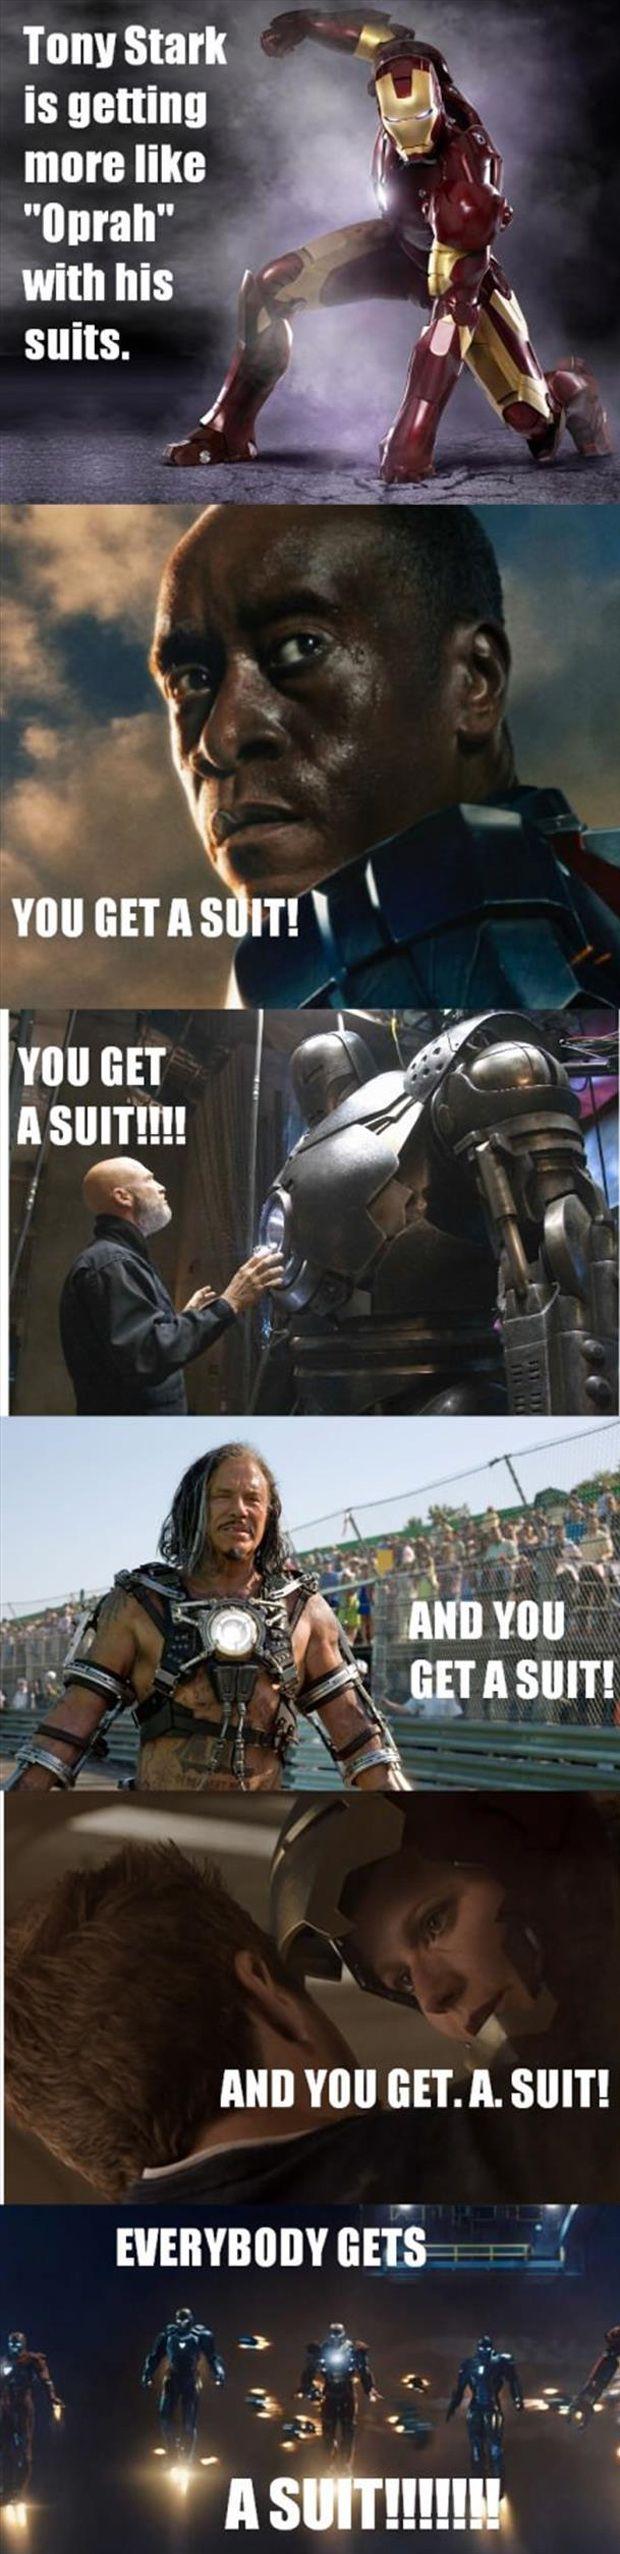 Tony Stark's Favorite Things